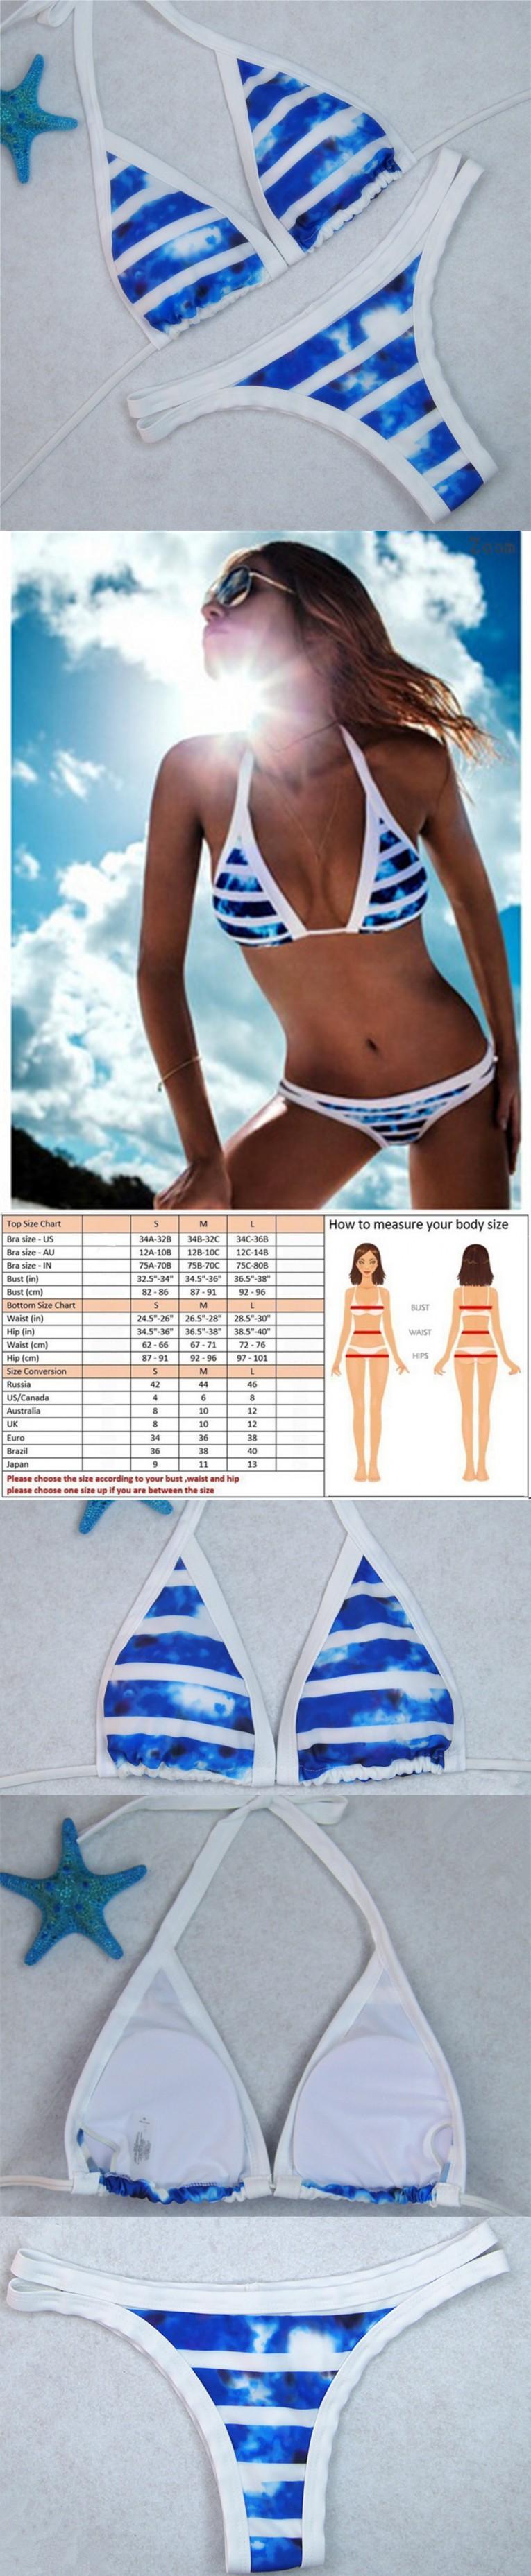 SEXY Retro PRINT BIKINI Tankini Mayo Micro Swimwear Push Up Beach Swimsuit Trikini Bandage Monokini Plaid Badpak Praia Pareo $11.22